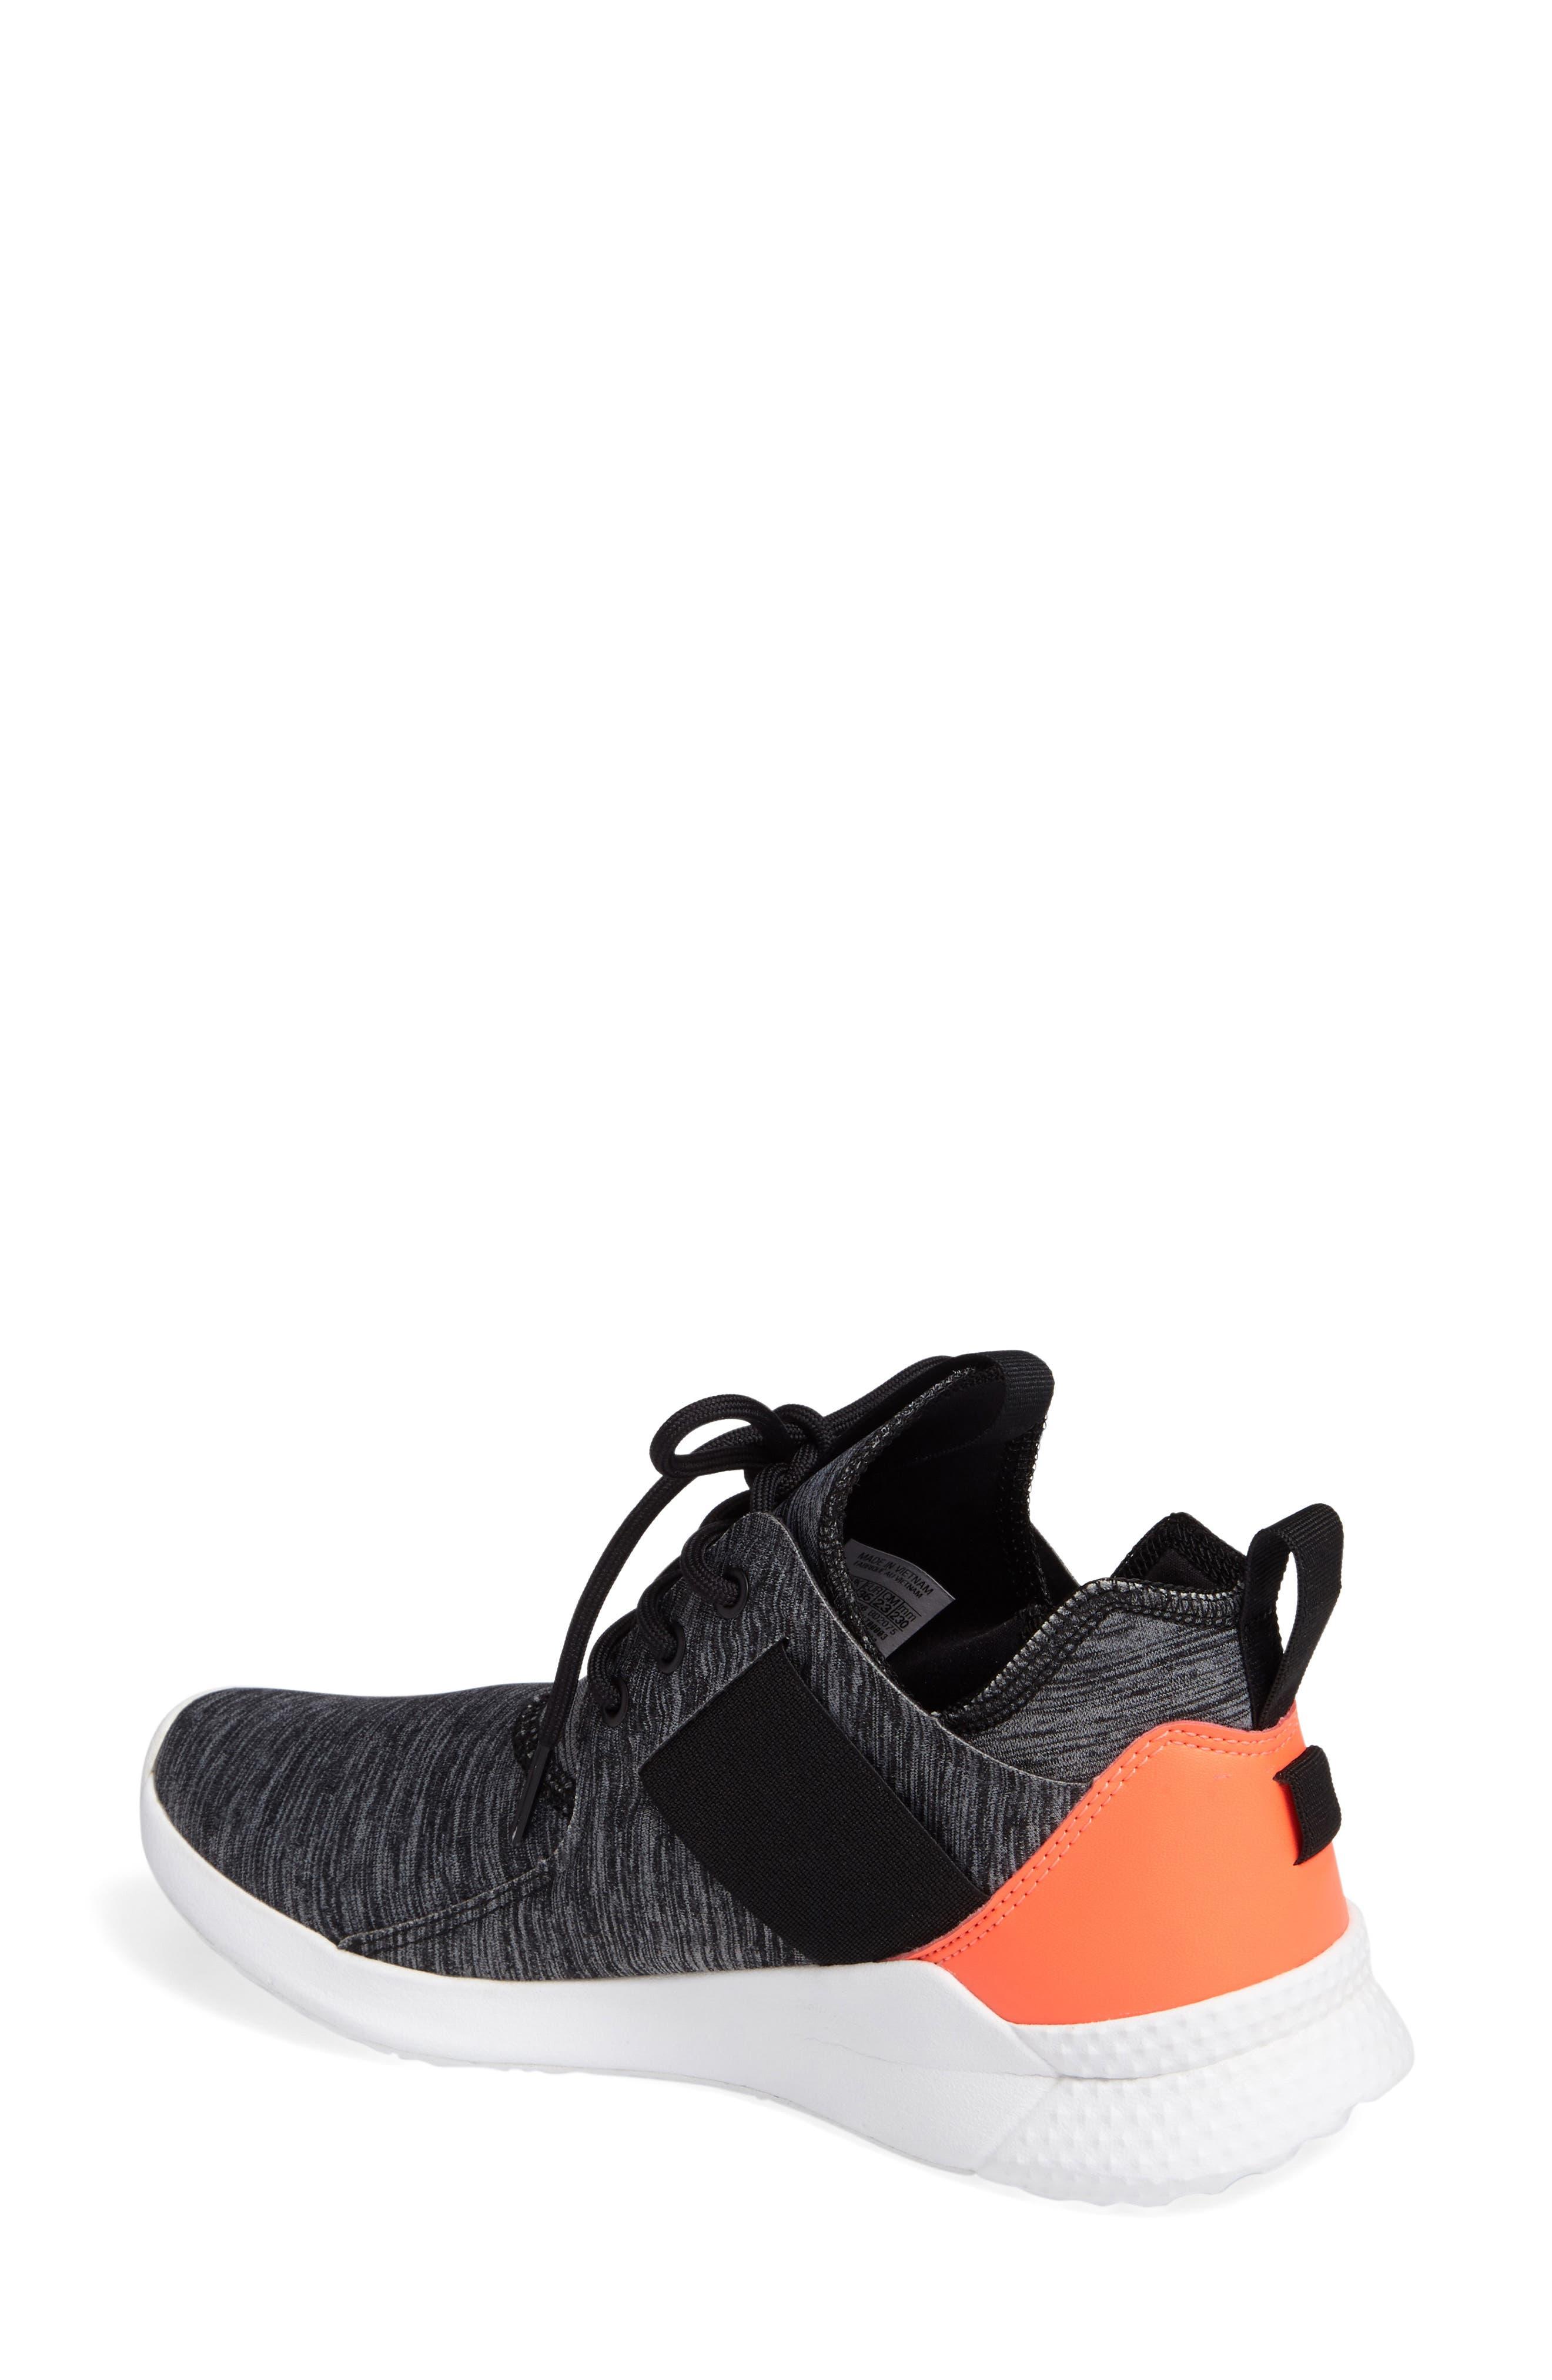 Guresu 1.0 Training Shoe,                             Alternate thumbnail 9, color,